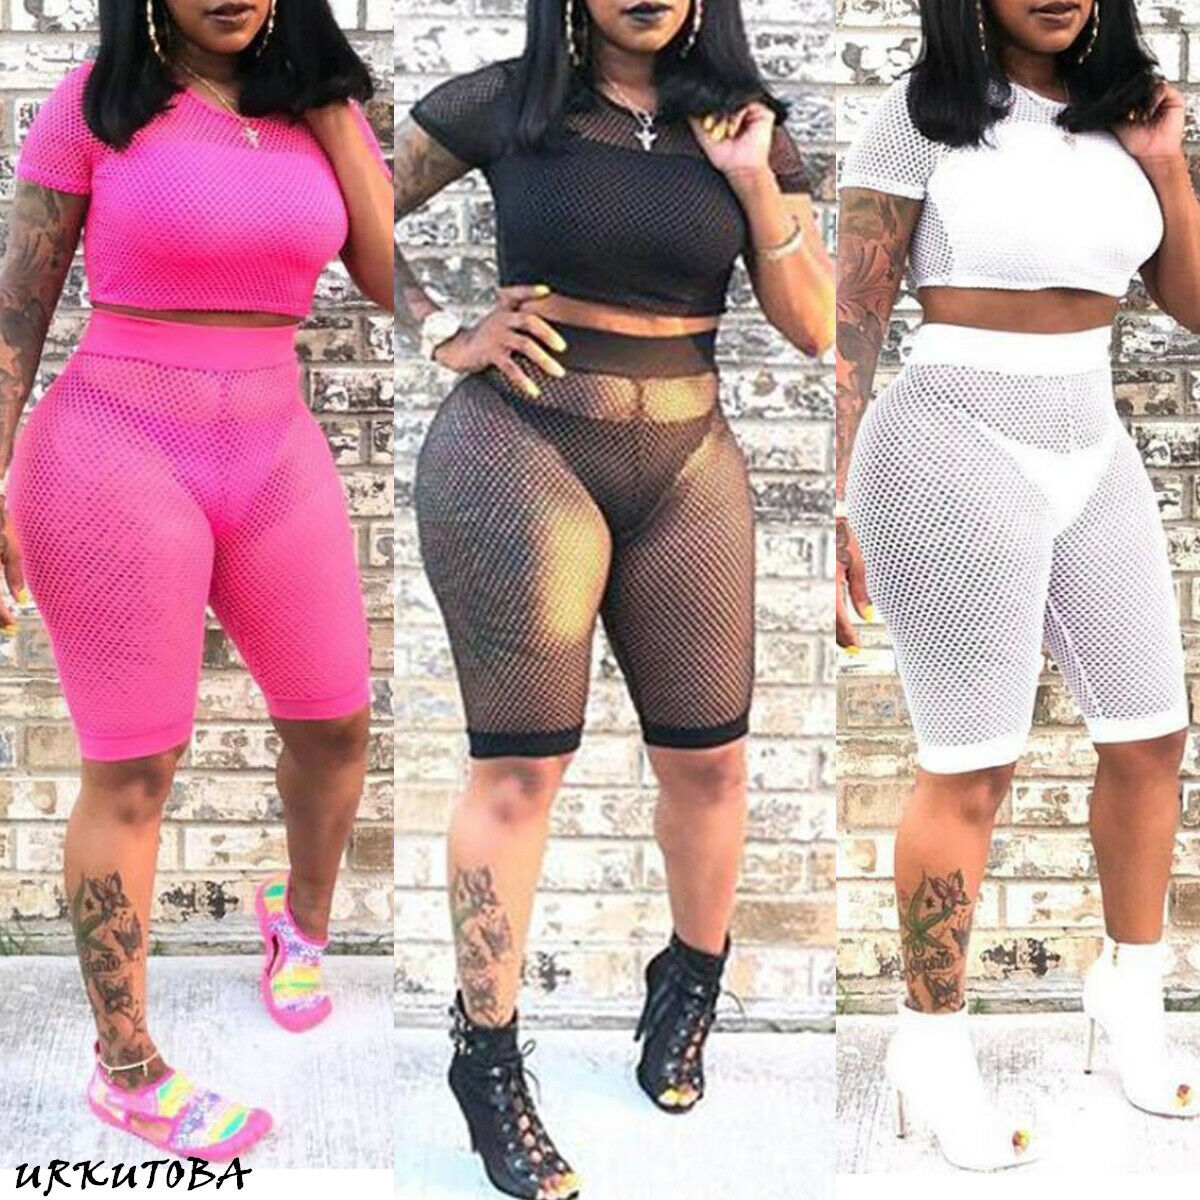 2020 Elegant Women Summer 2 Piece Hollow Mesh Crop Top Shorts Cover-Ups Fish Net Mesh See Through Sexy Beachwear Cover Up Sets